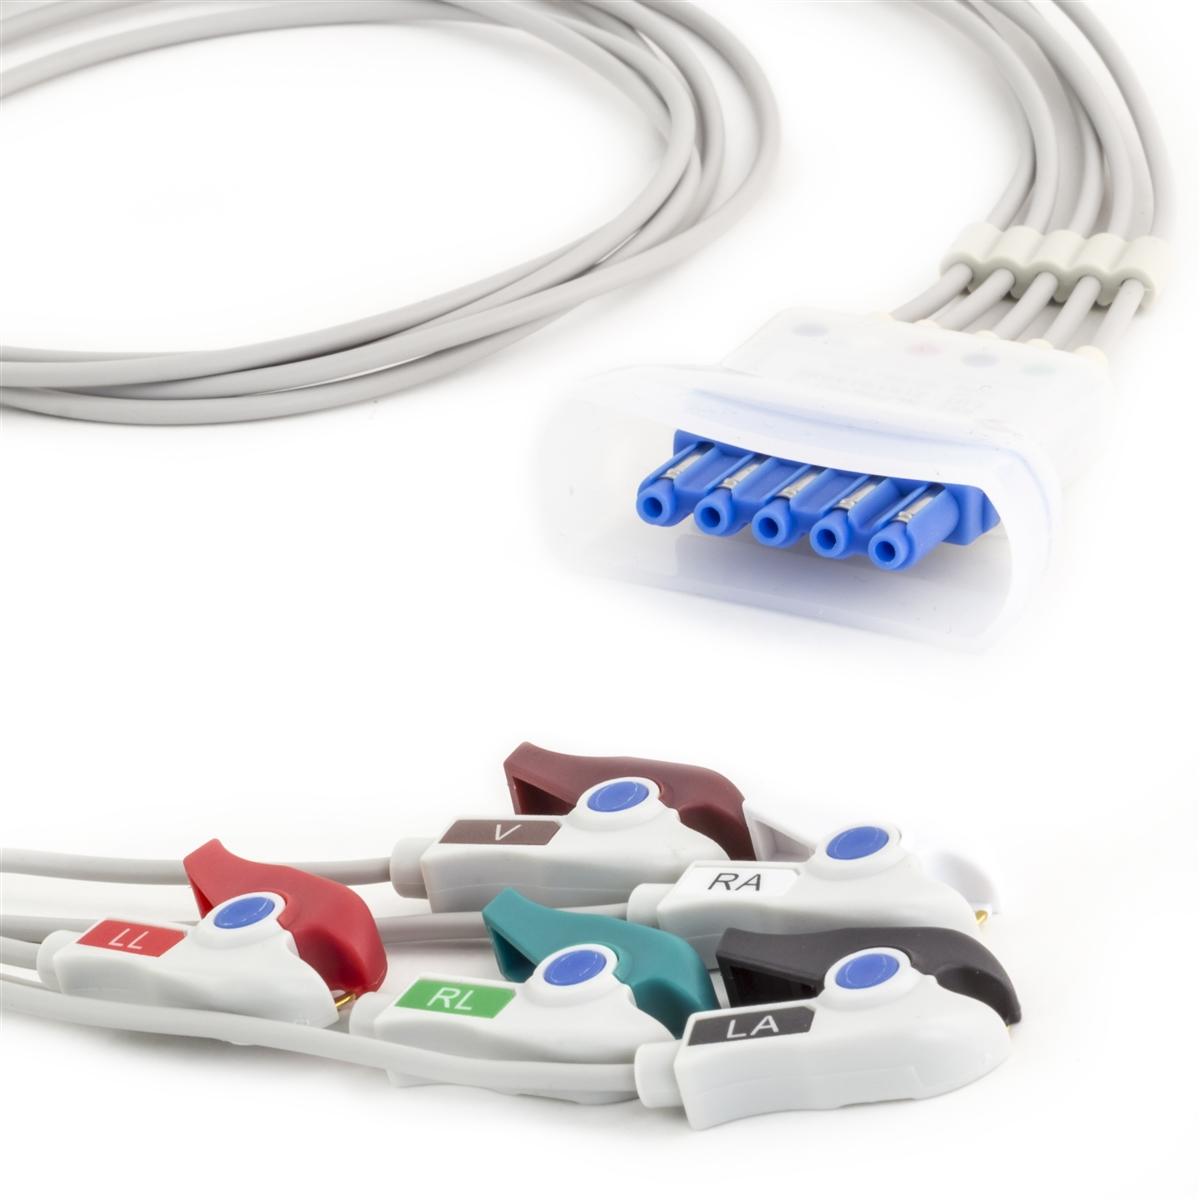 Philips 5 Lead Single Pin w/Tele Shield ECG Leadwires - Grabber